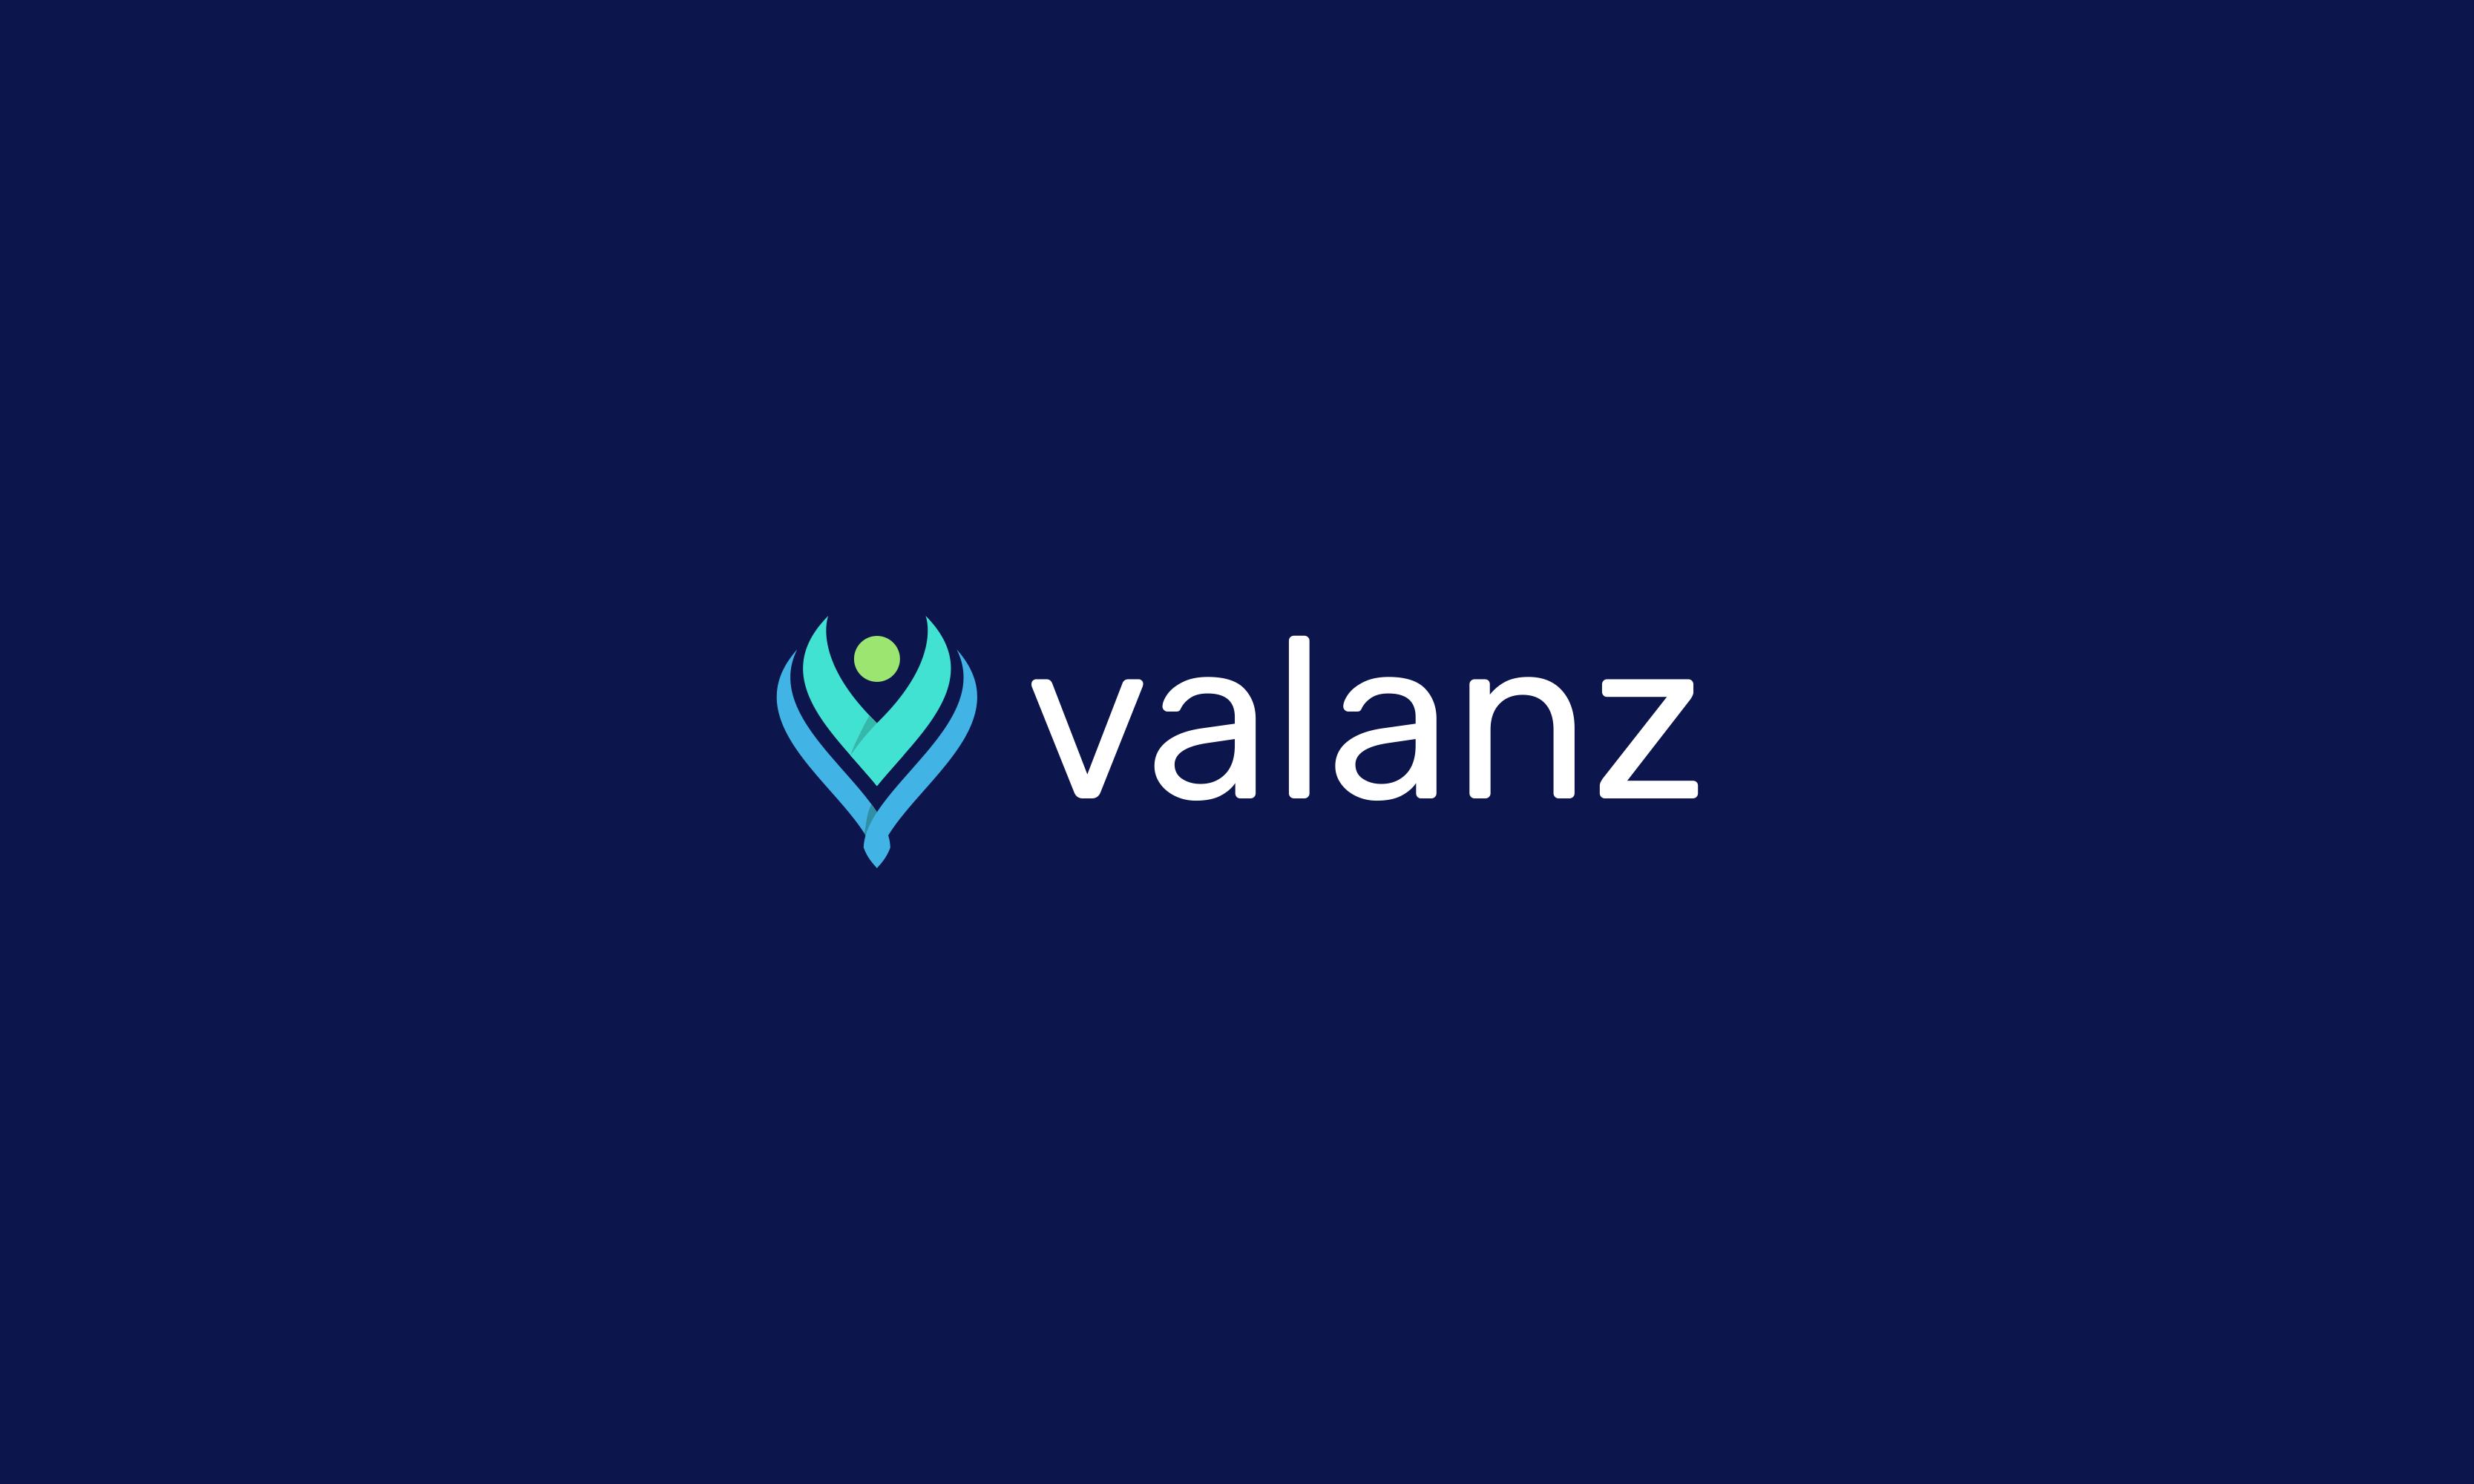 Valanz